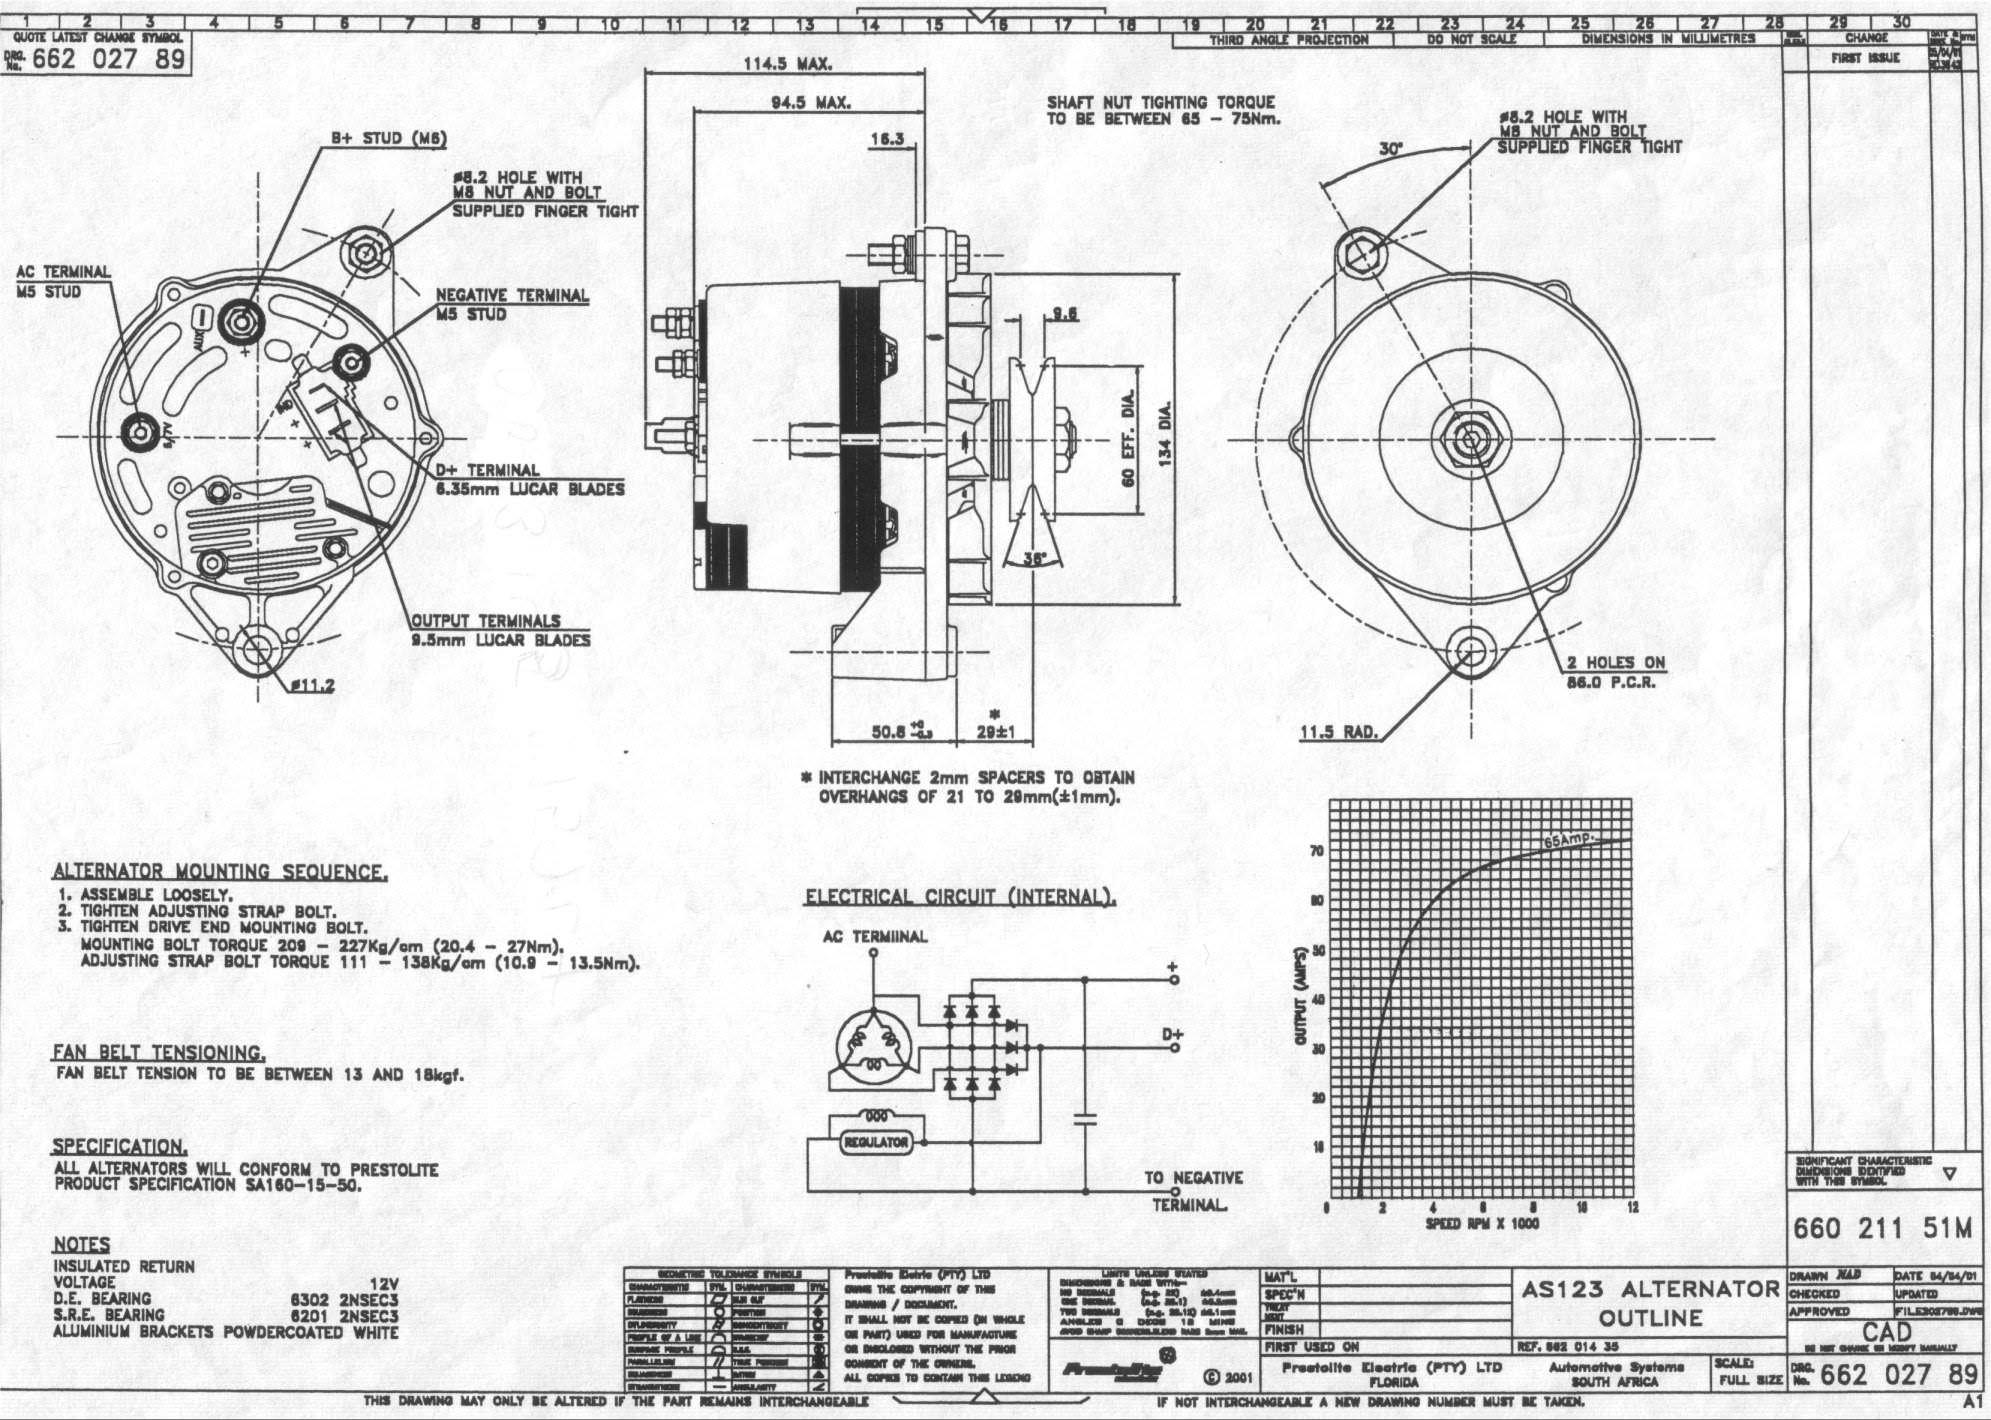 24v alternator wiring diagram 24vdc charger wiring diagram